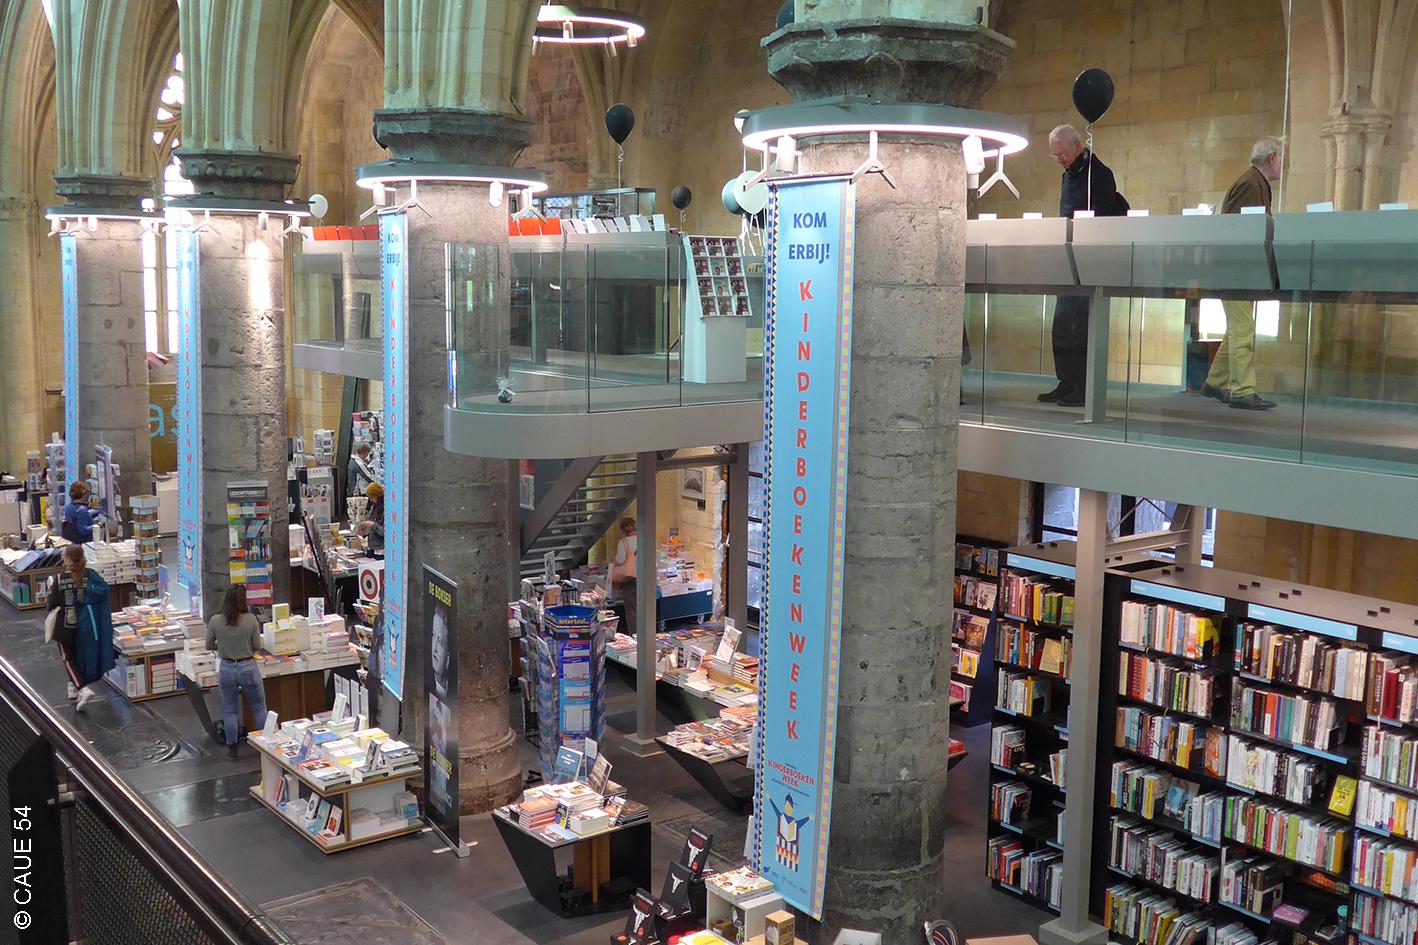 Librairie des Dominicains - Maastricht - Pays-Bas